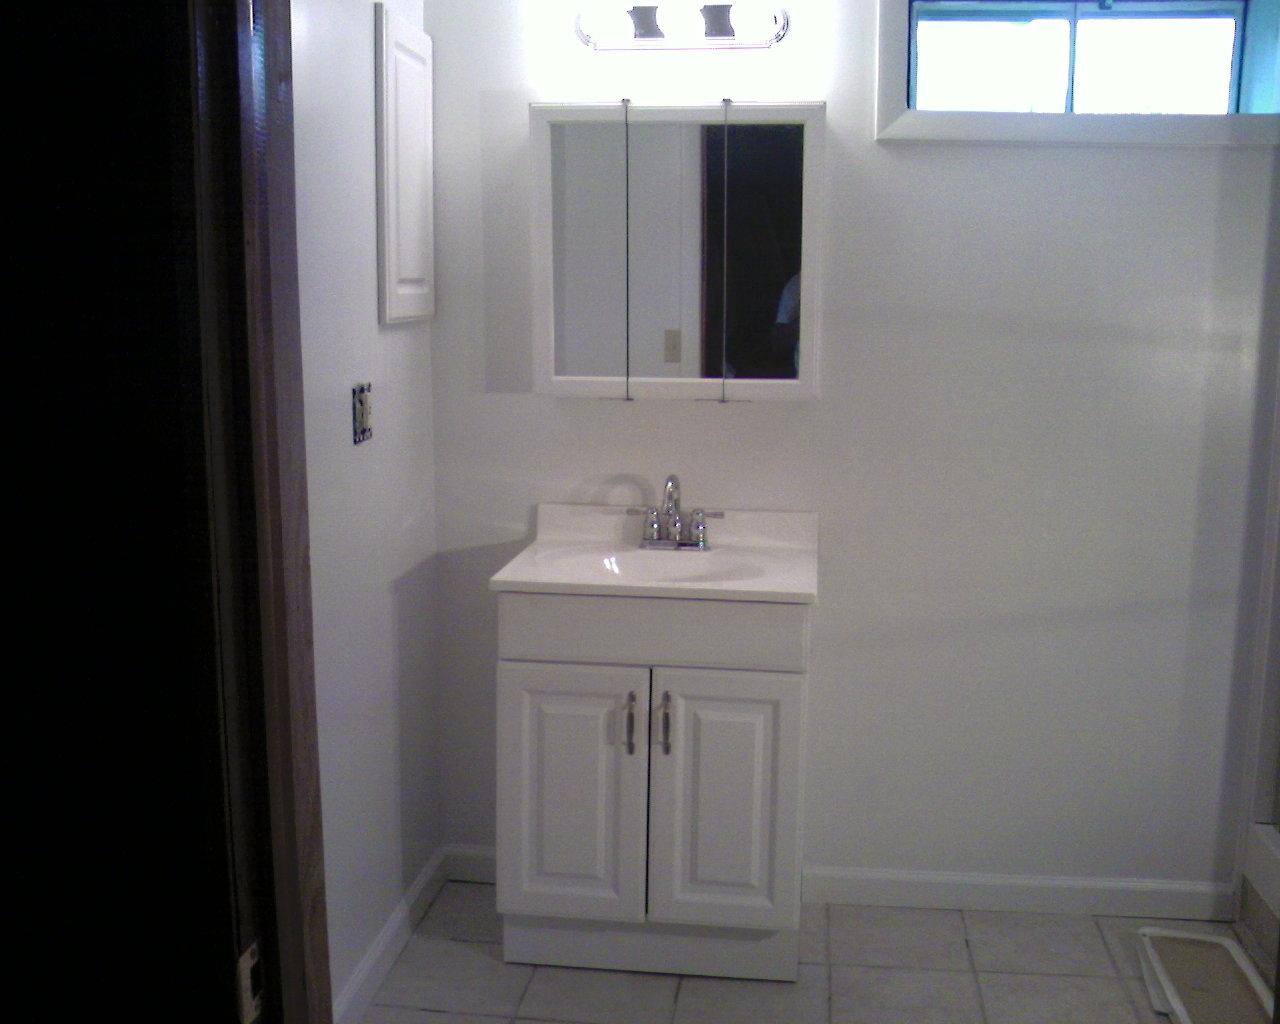 Basement sink and vanity unit